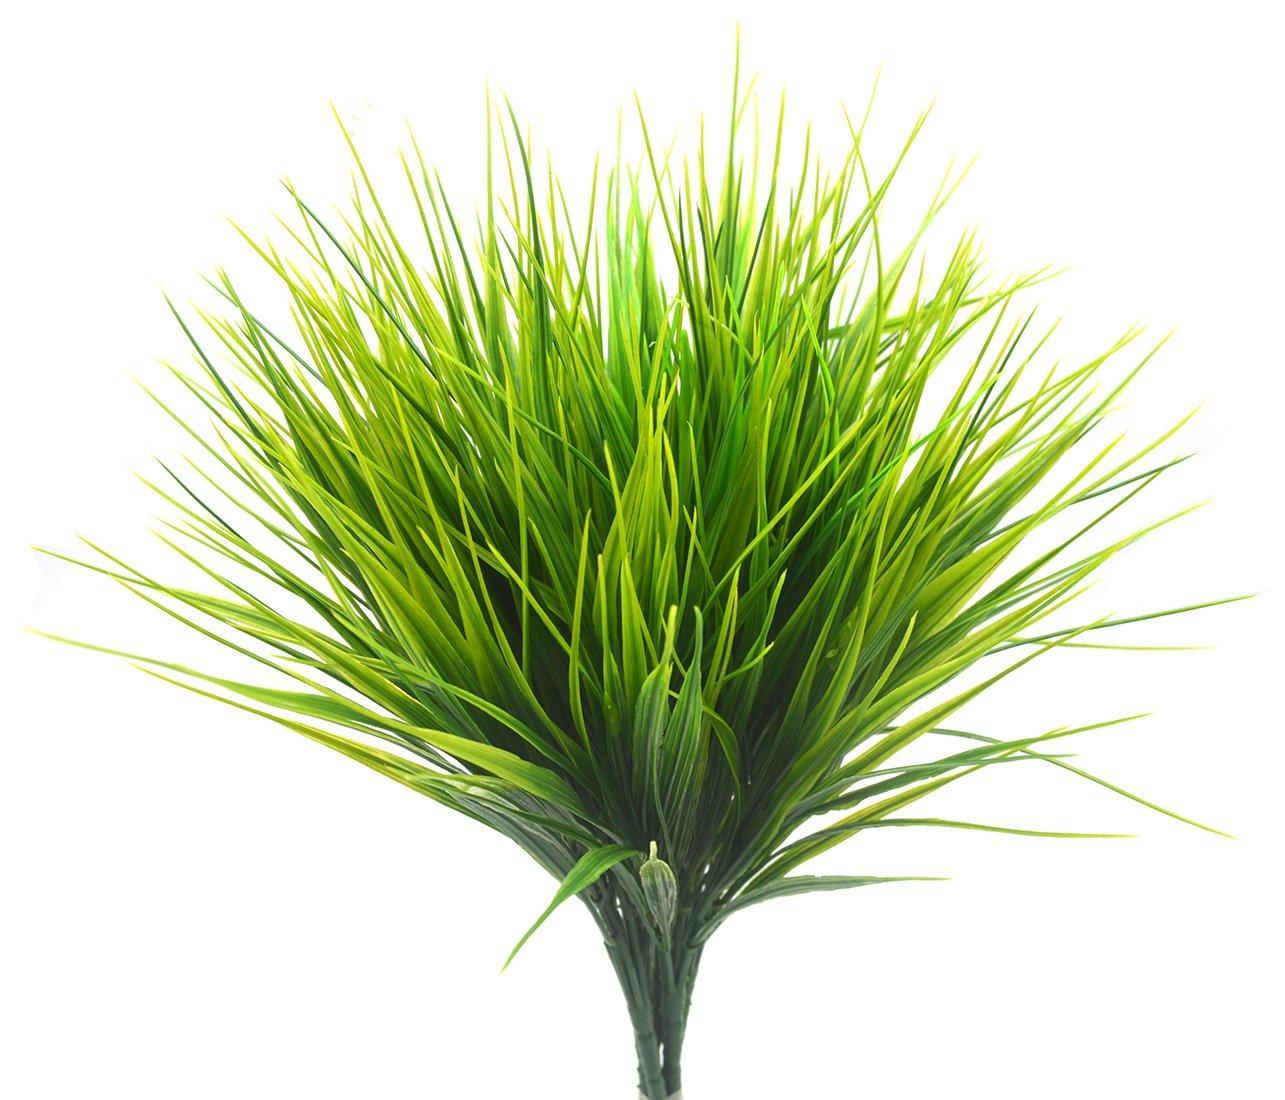 Bird Fiy Plastic Wheat Grass Fake Leaves Shrubs Greenery Bushes Indoor Outside Home Garden Office Verandah Wedding Decor/4Pcs